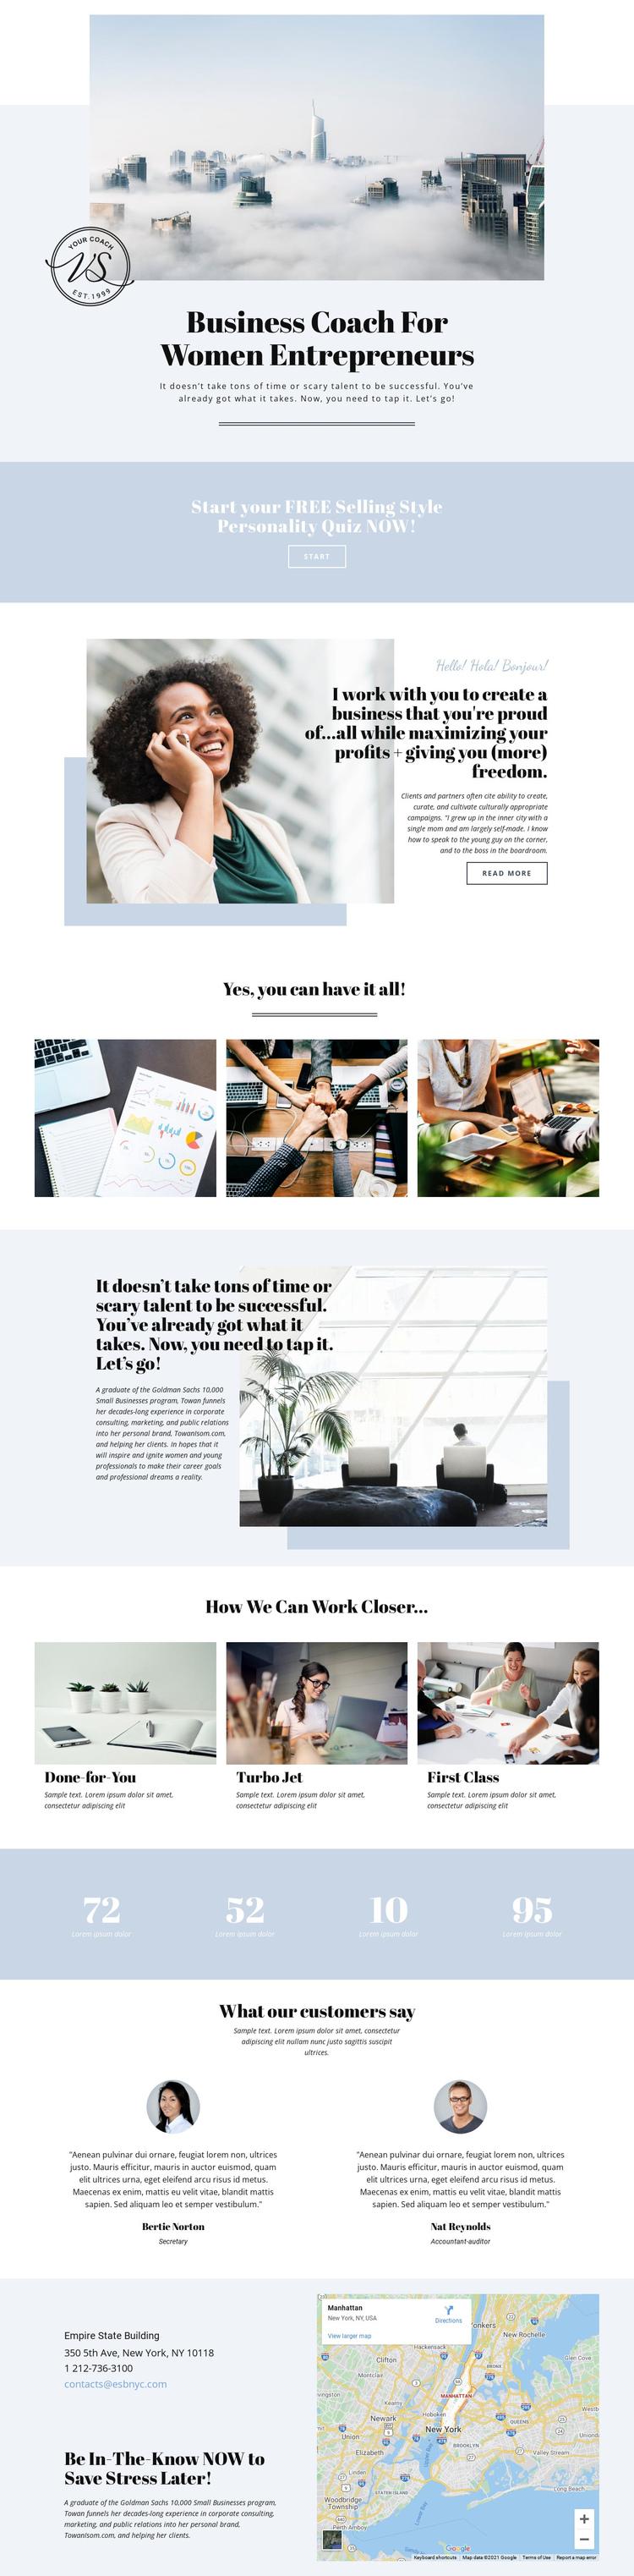 Business women entrepreneurs Website Builder Software